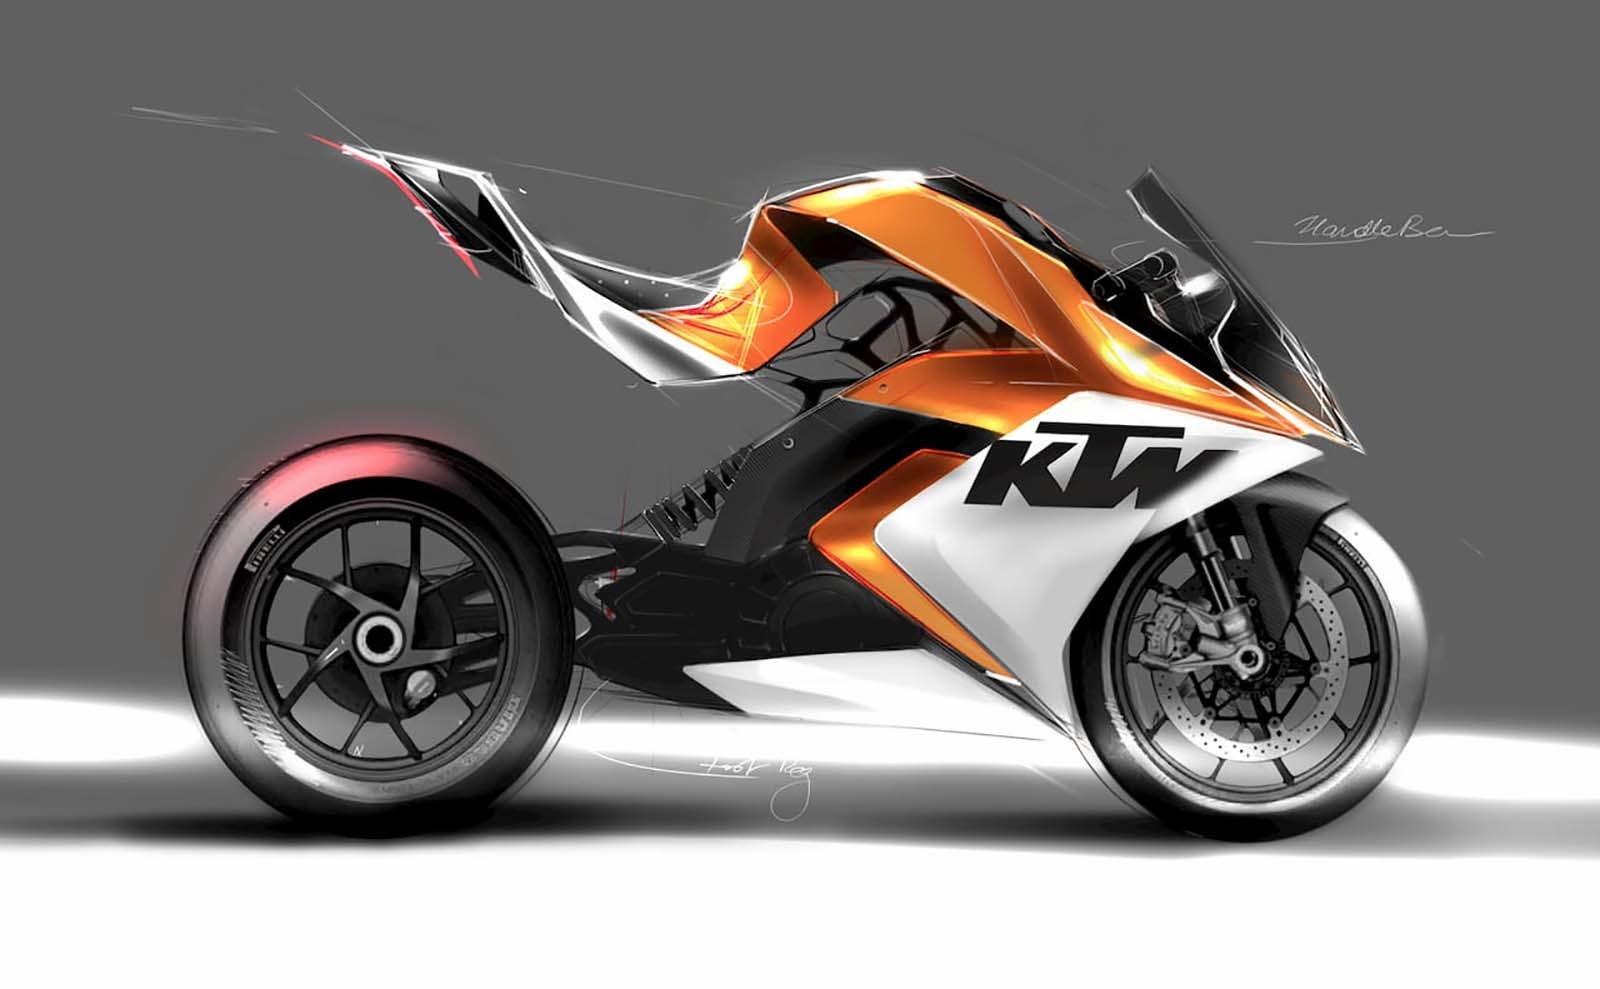 KTM の SS系電動バイクをイメージしたコンセプト_f0004270_20082195.jpg